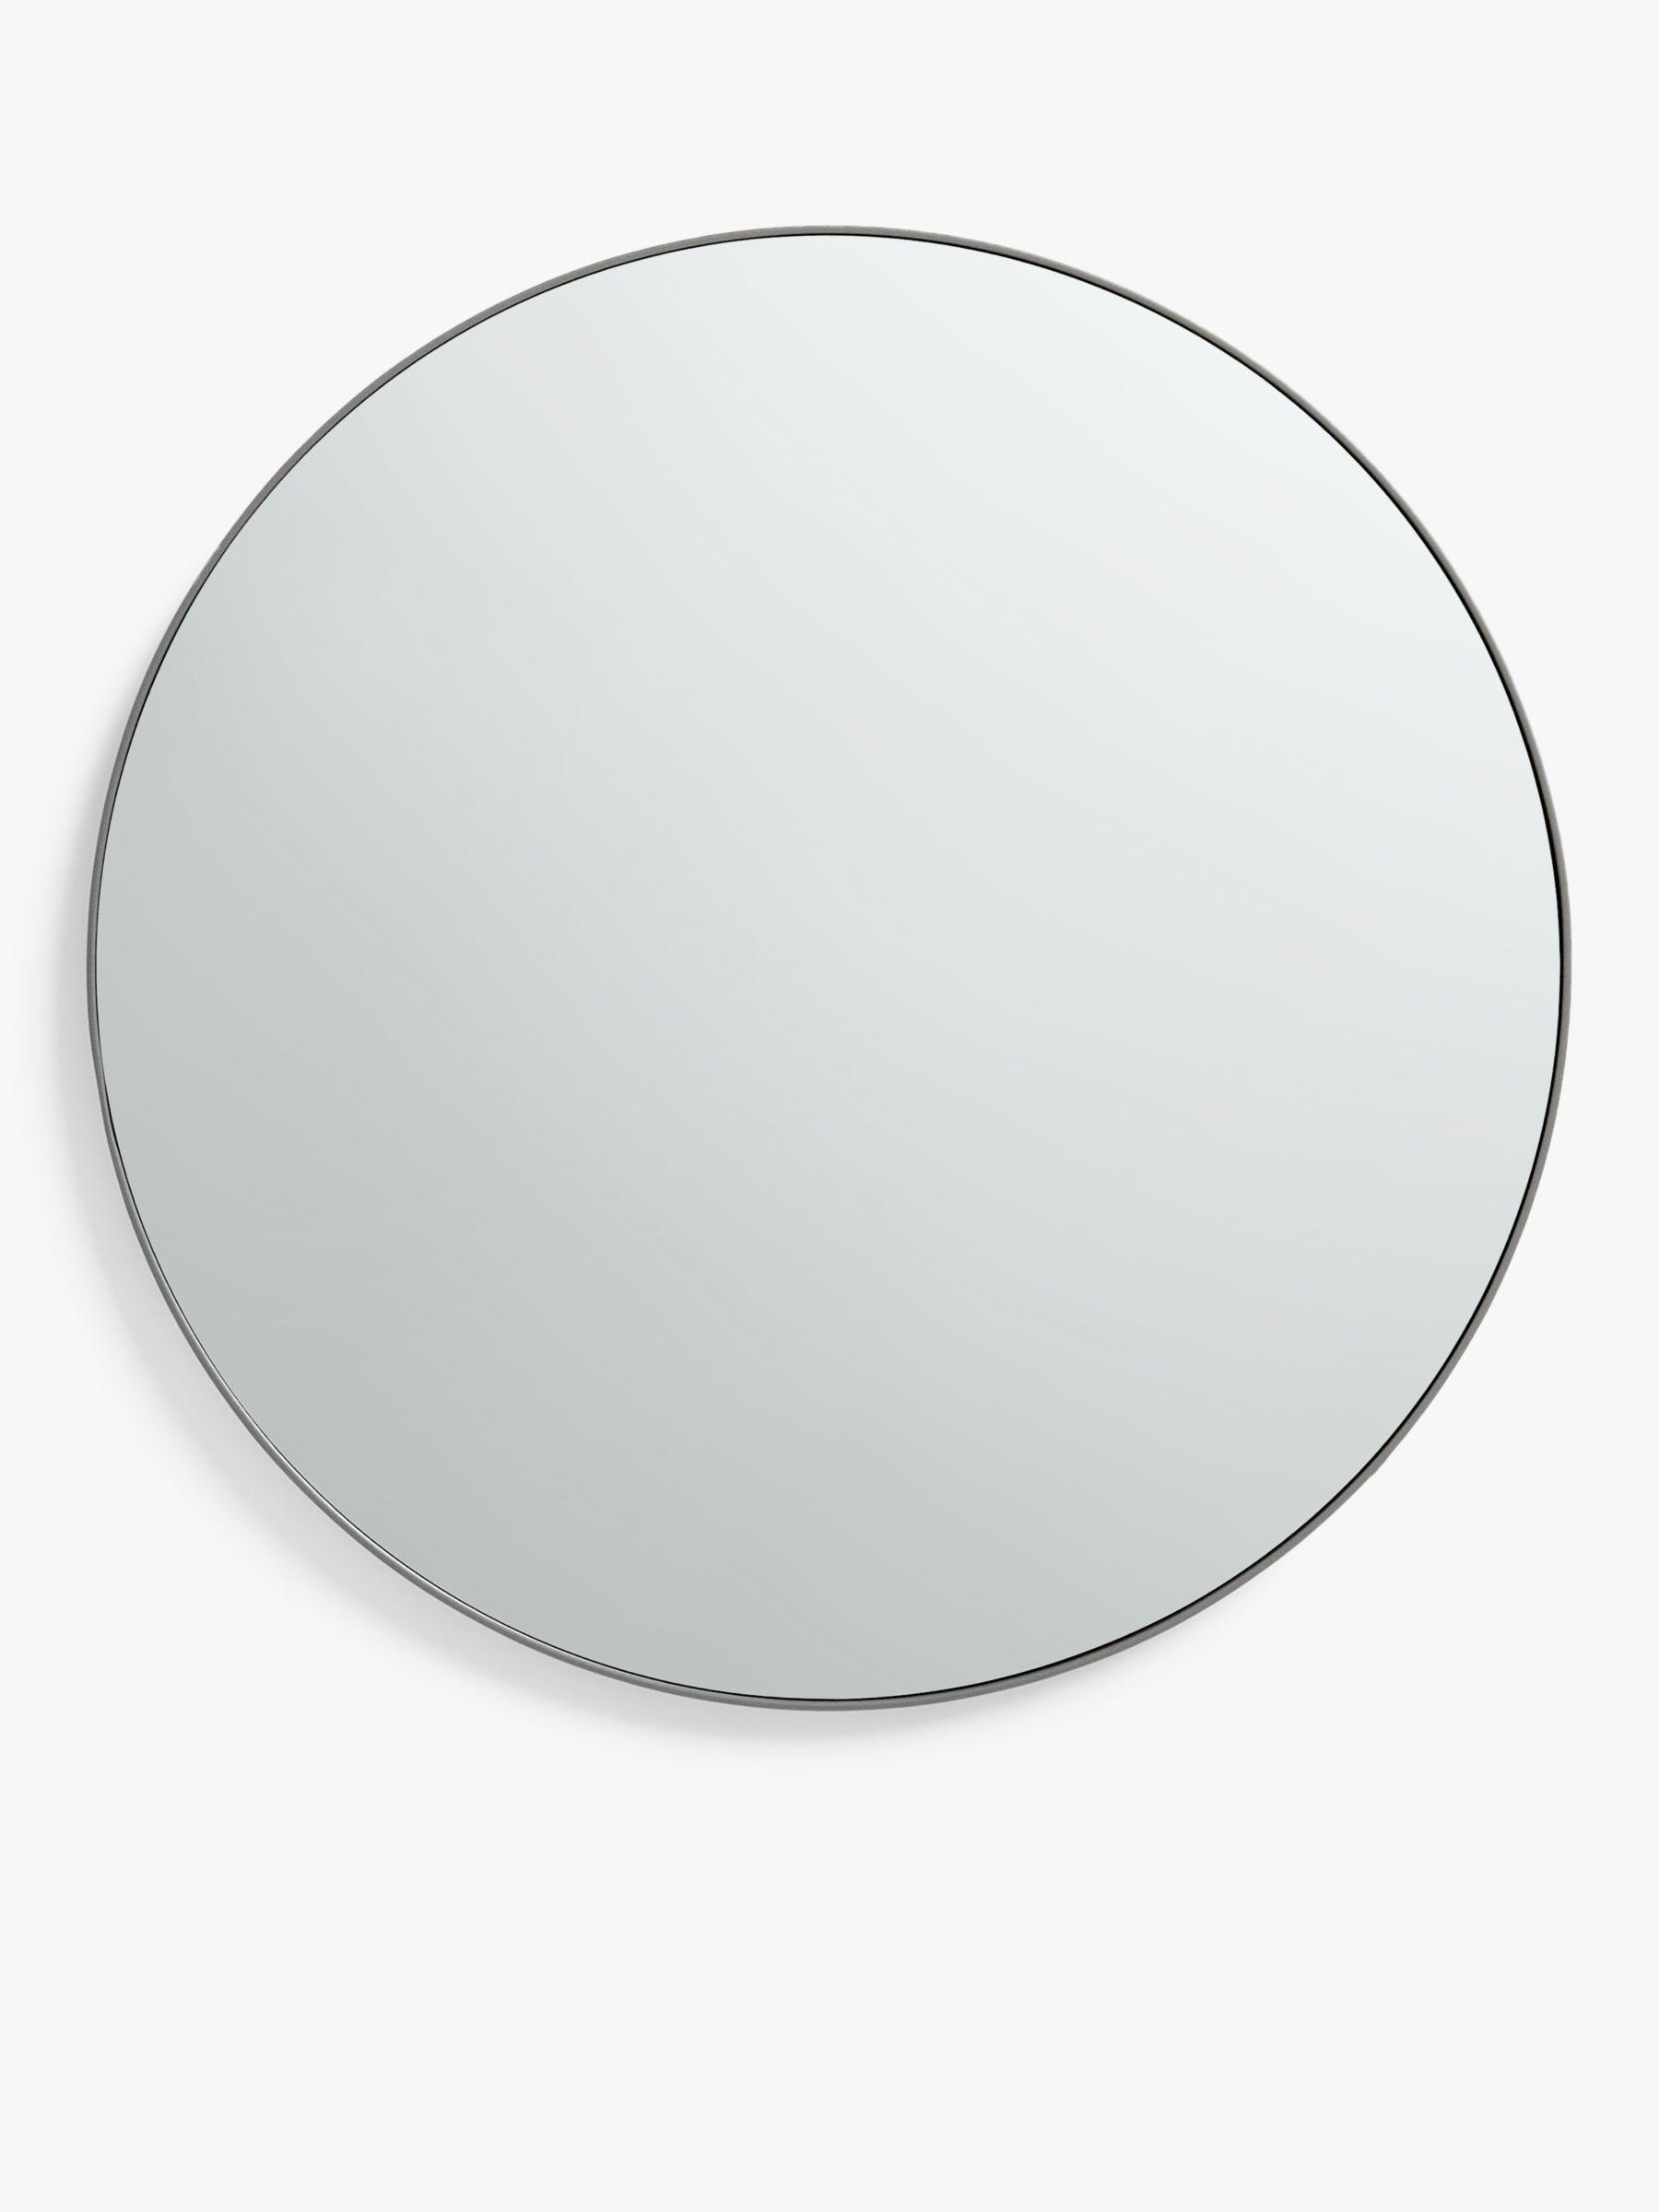 John Lewis & Partners Metal Frame Small Round Mirror, 50cm